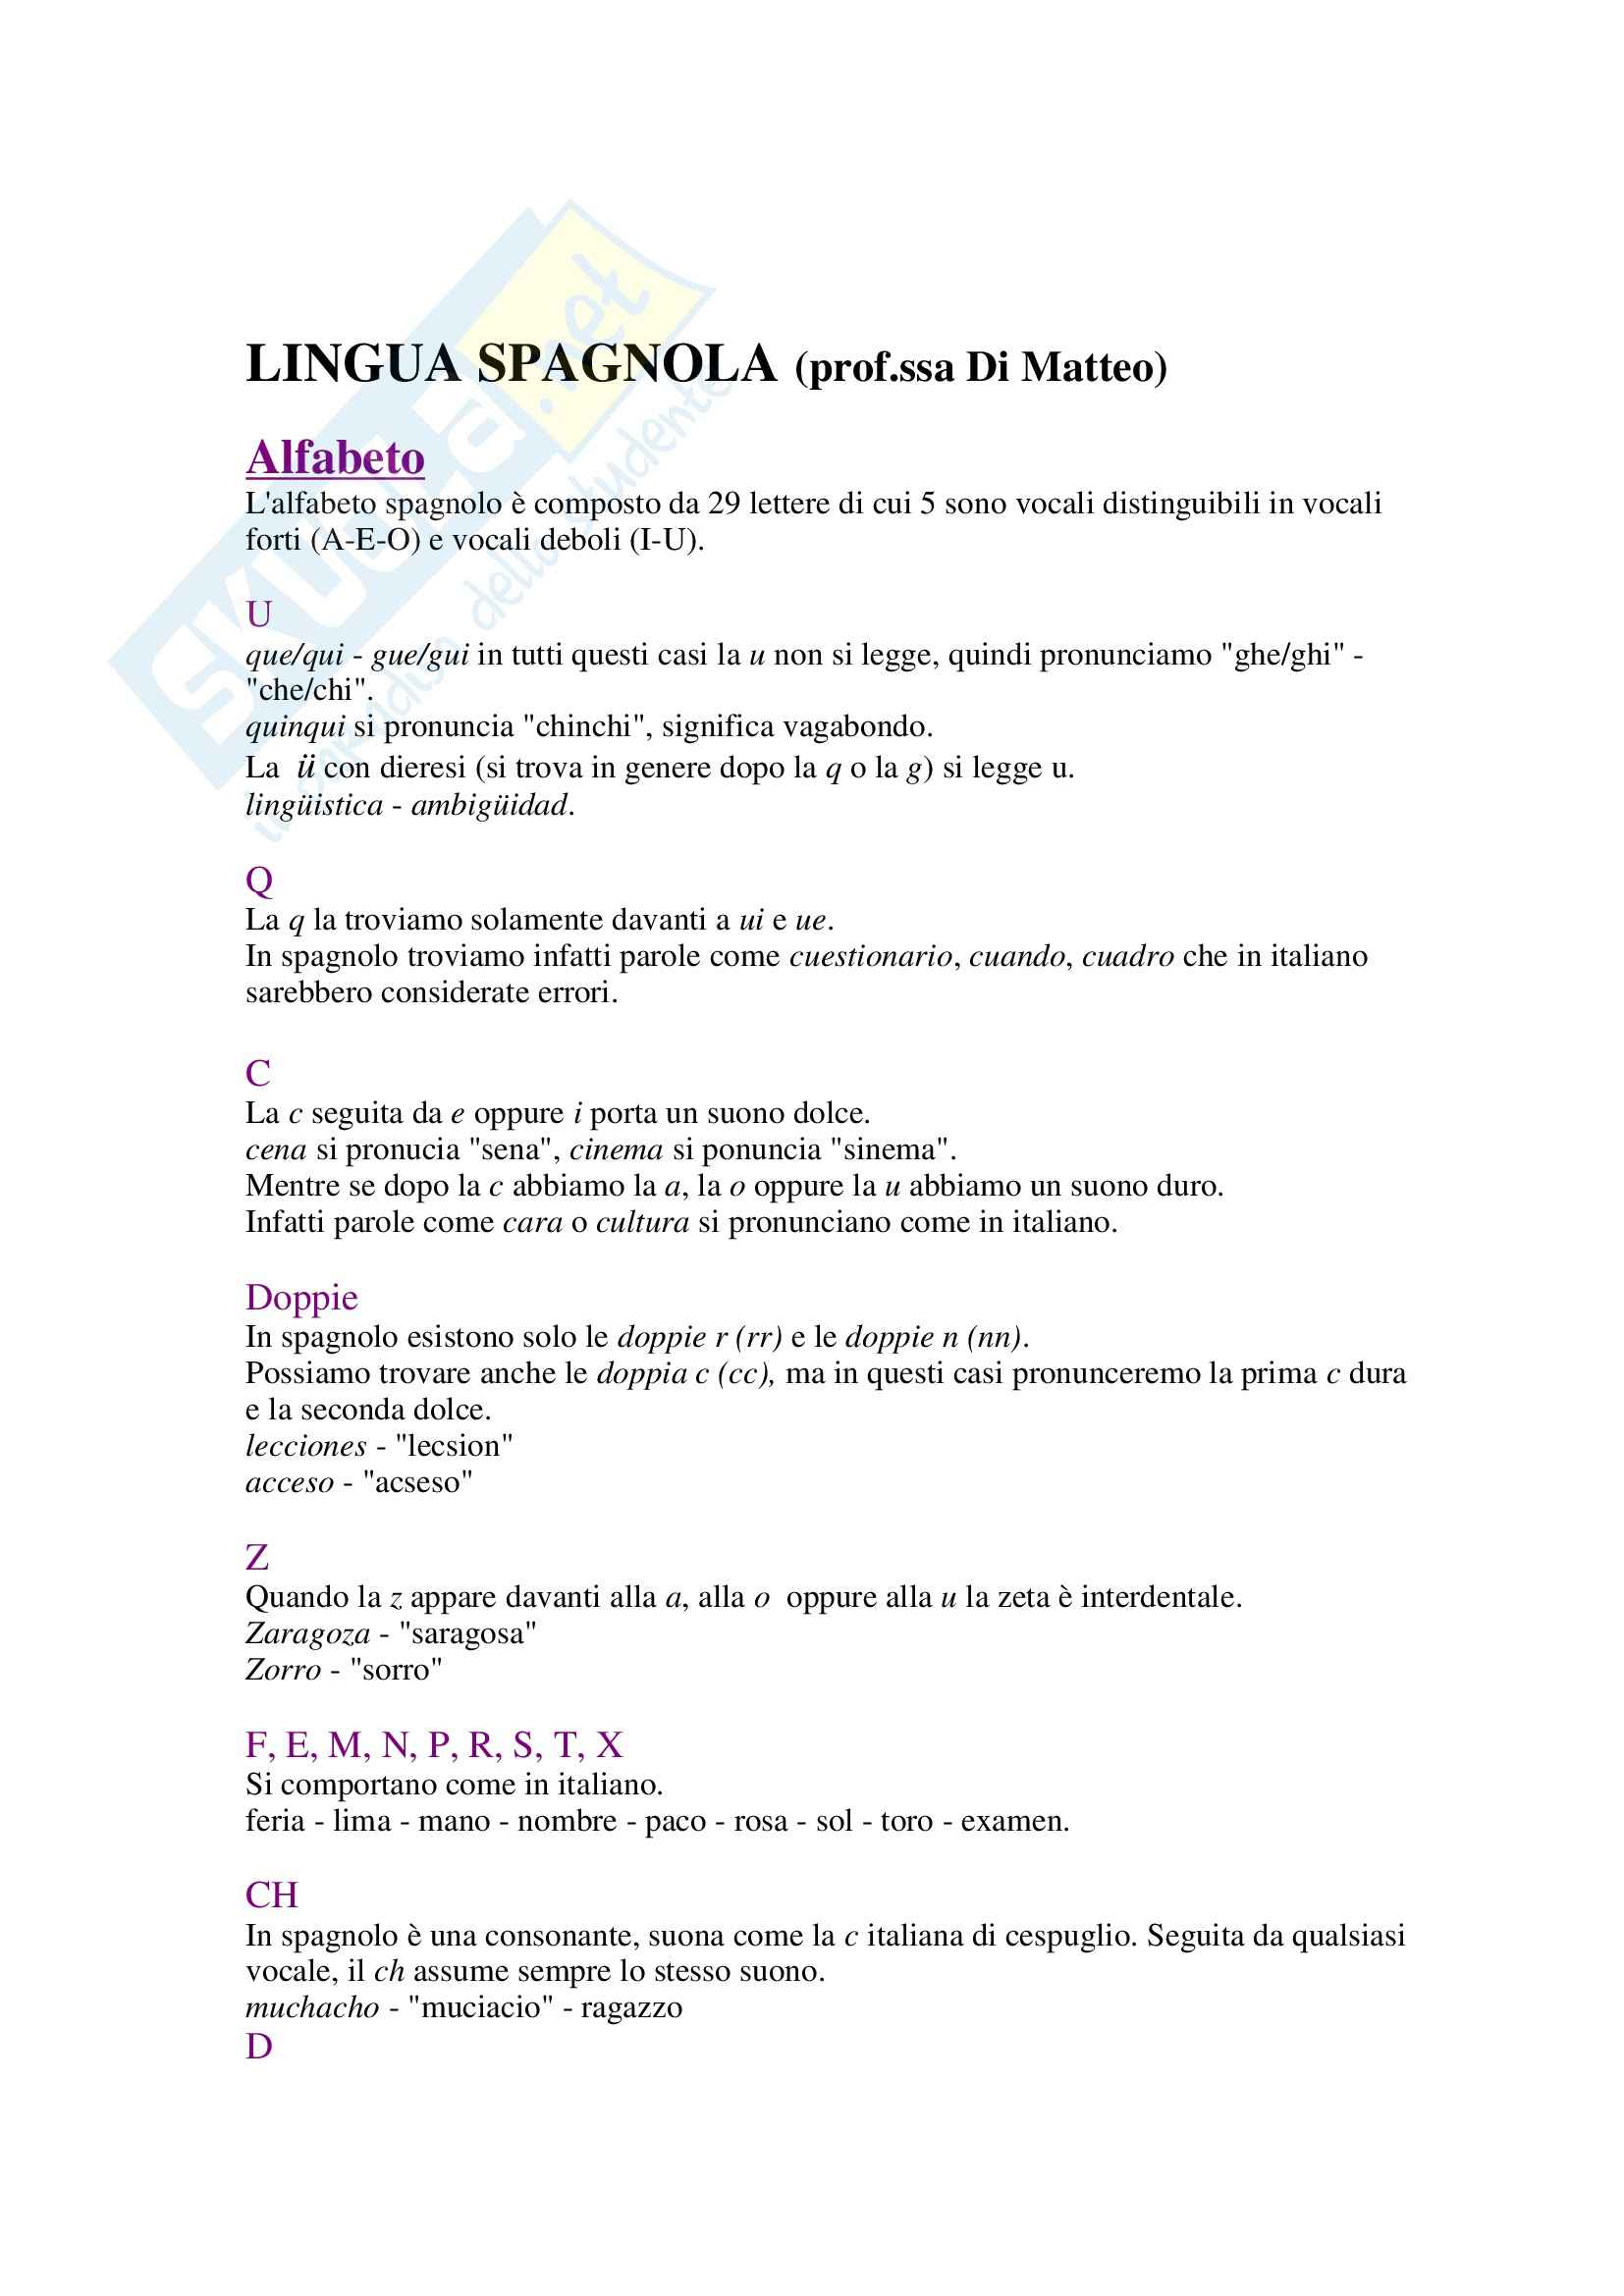 Lingua spagnola - l'alfabeto spagnolo